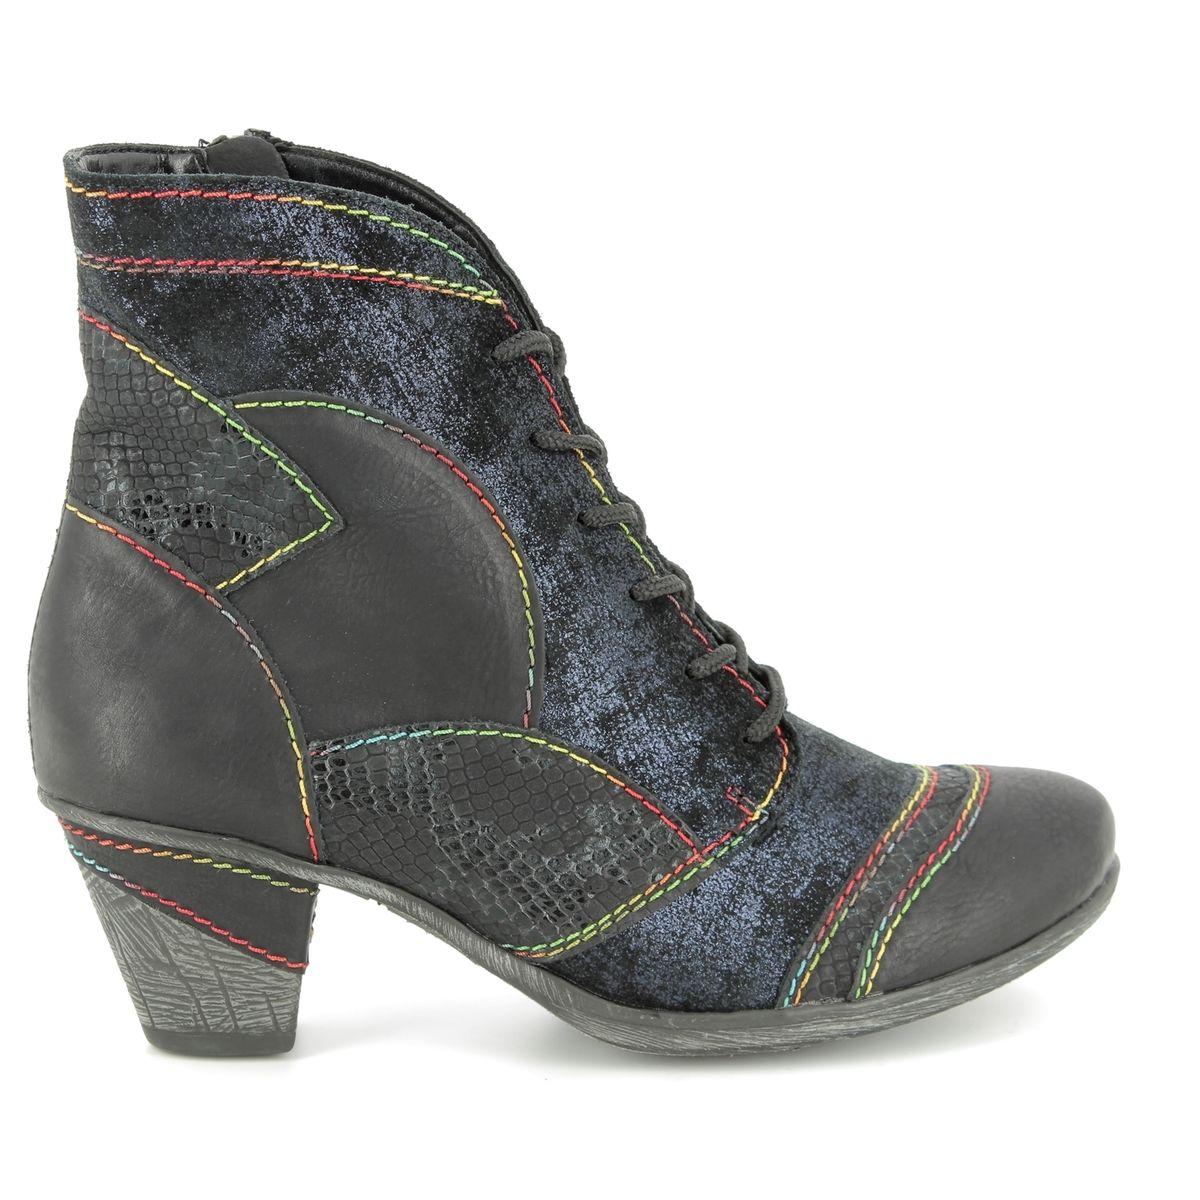 84e33beaf110 Remonte Ankle Boots - Black - D8774-02 ANNITELA